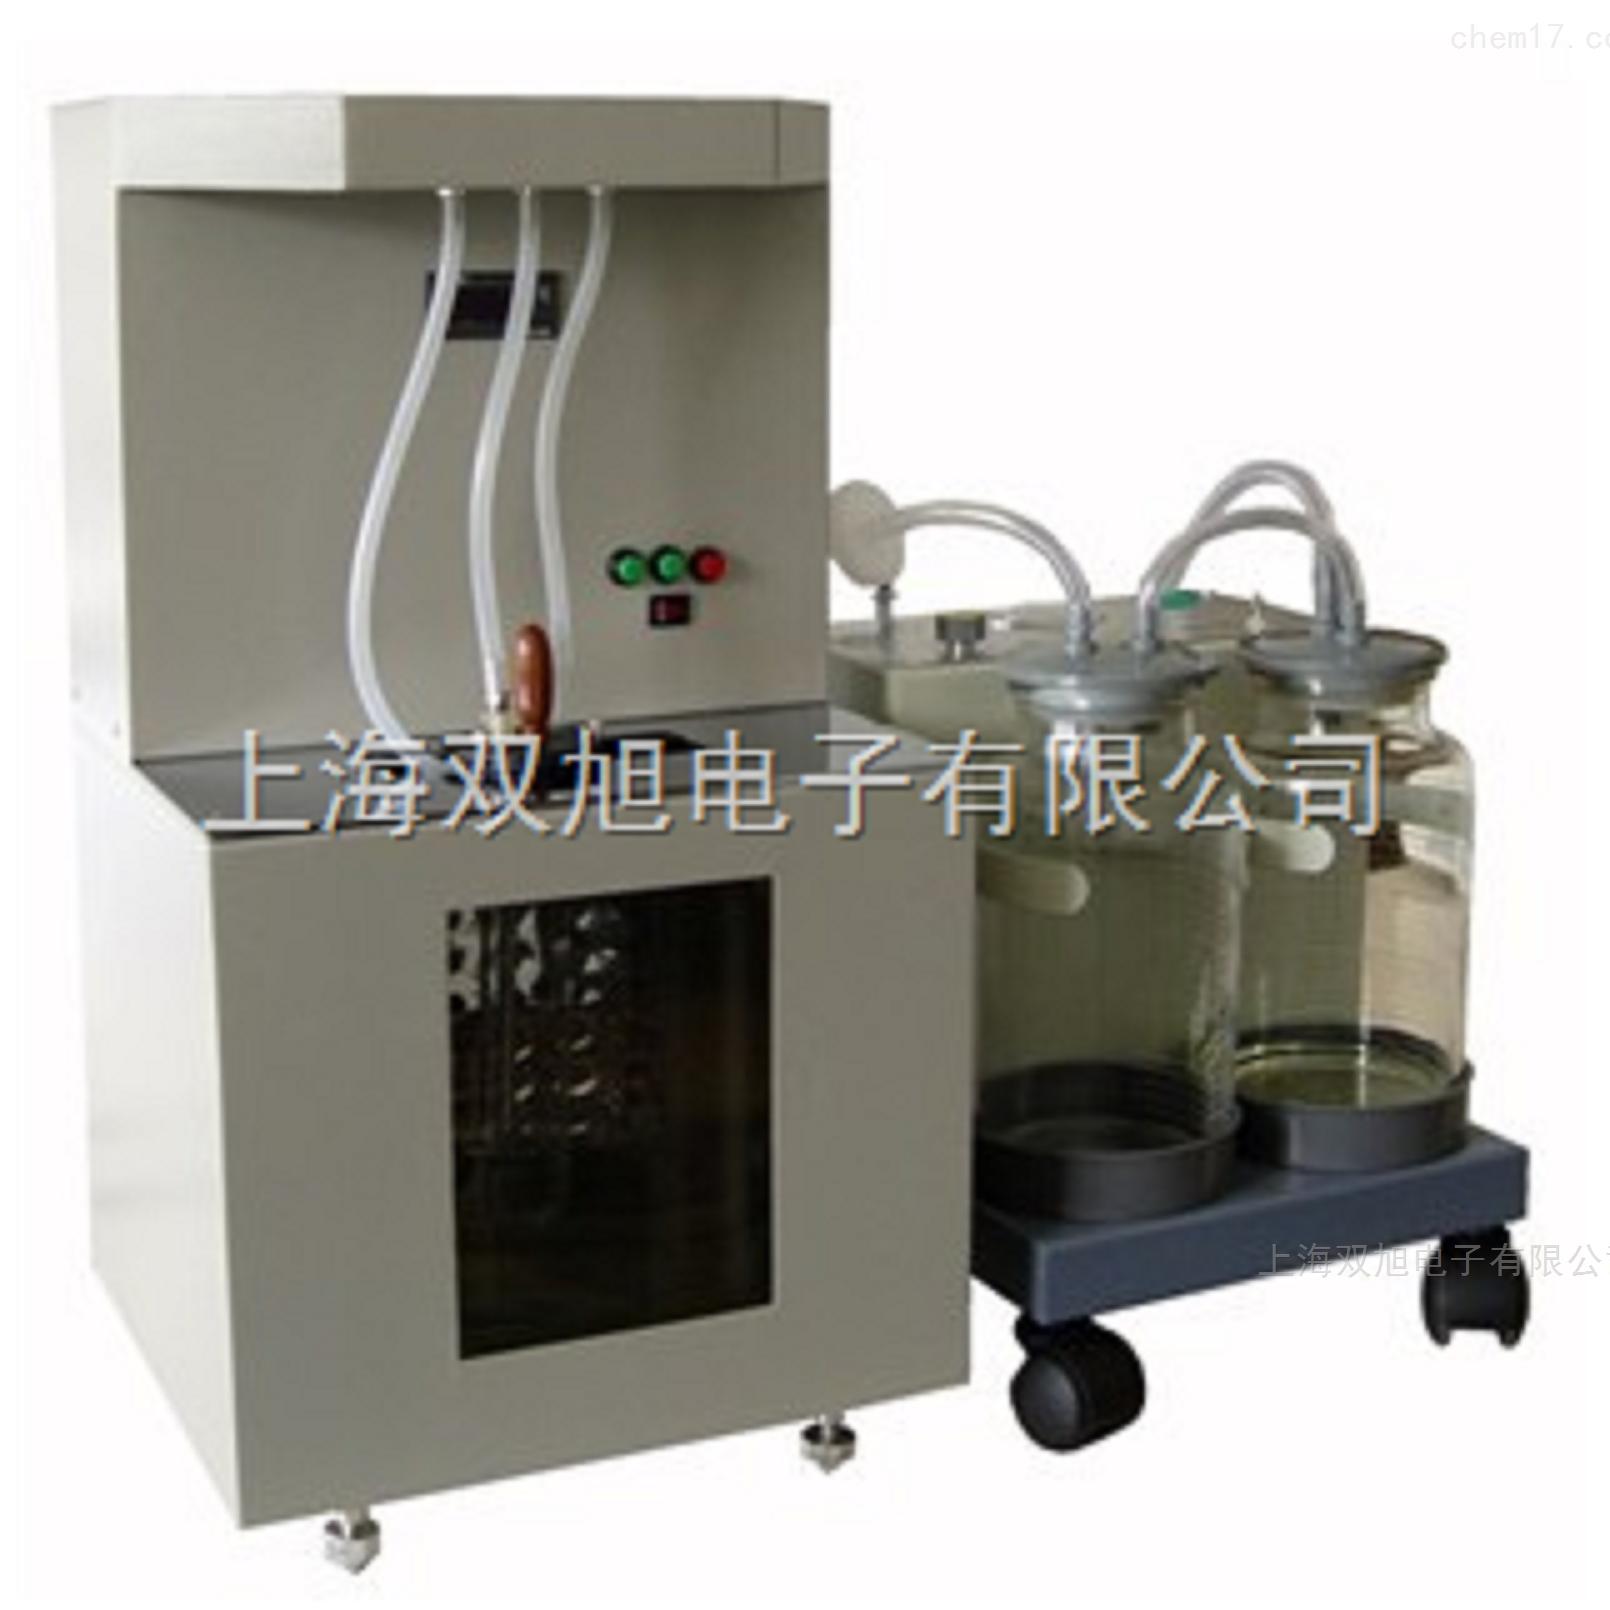 SYD265-3 自动毛细管粘度计清洗器